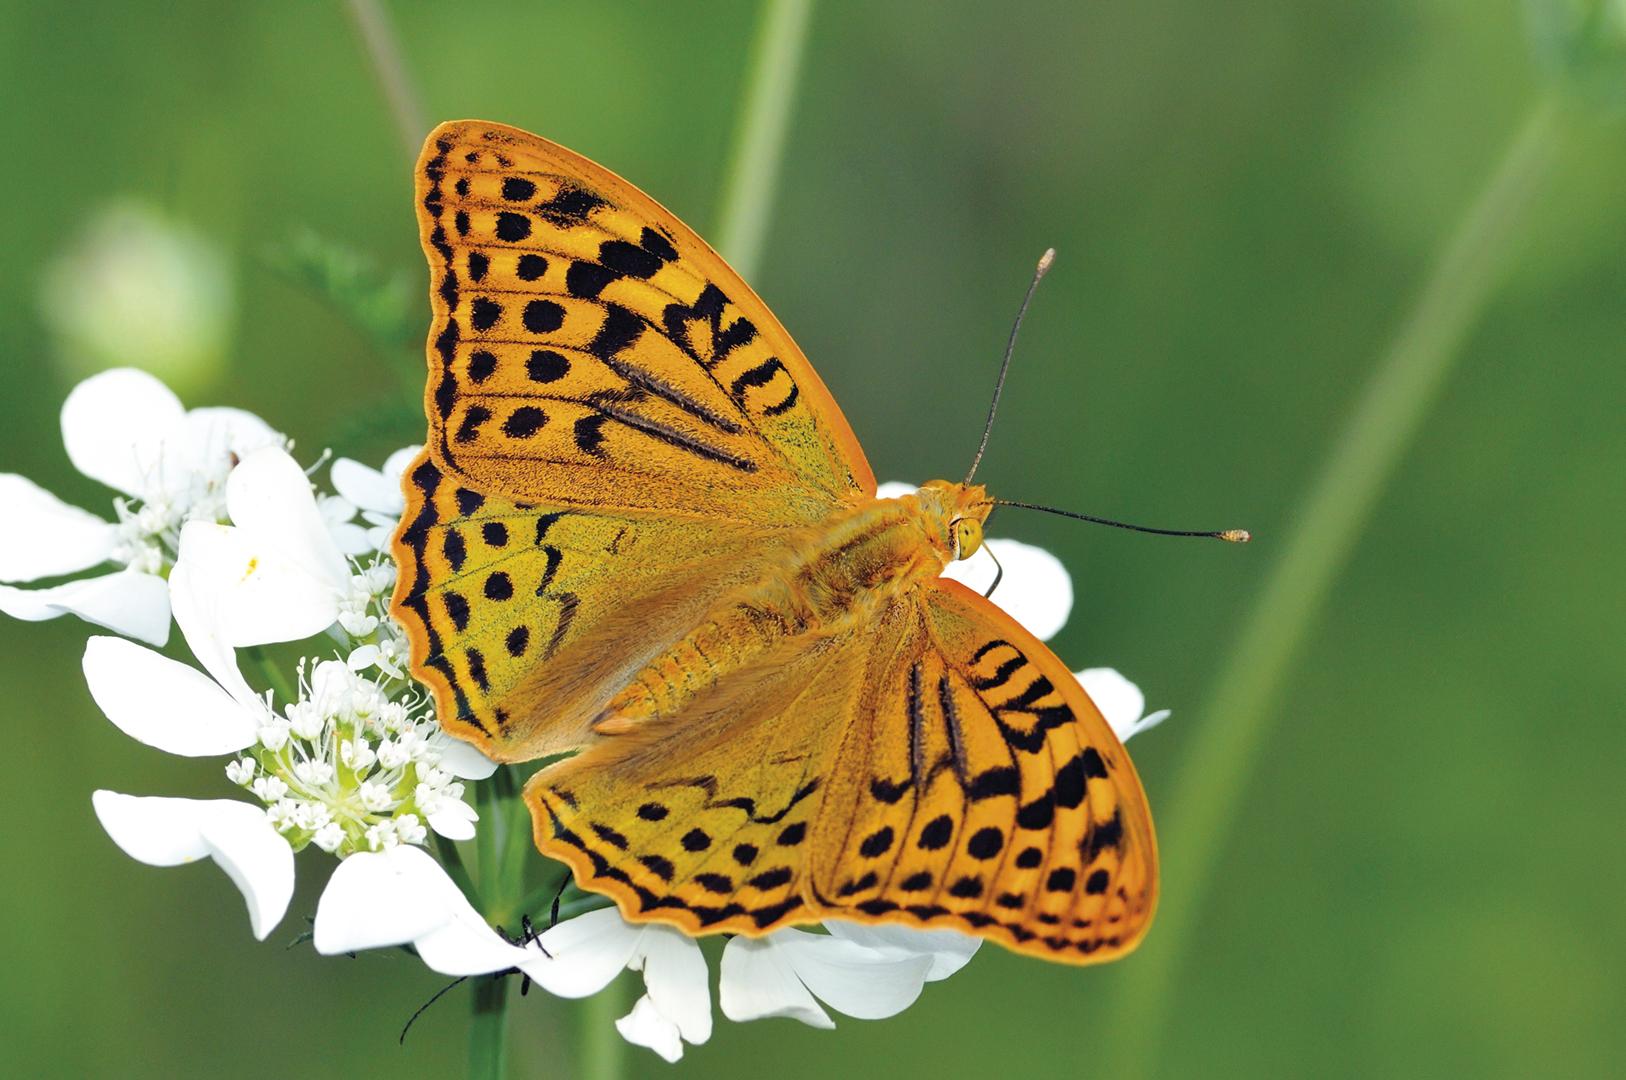 Farfalla Giardino Botanico